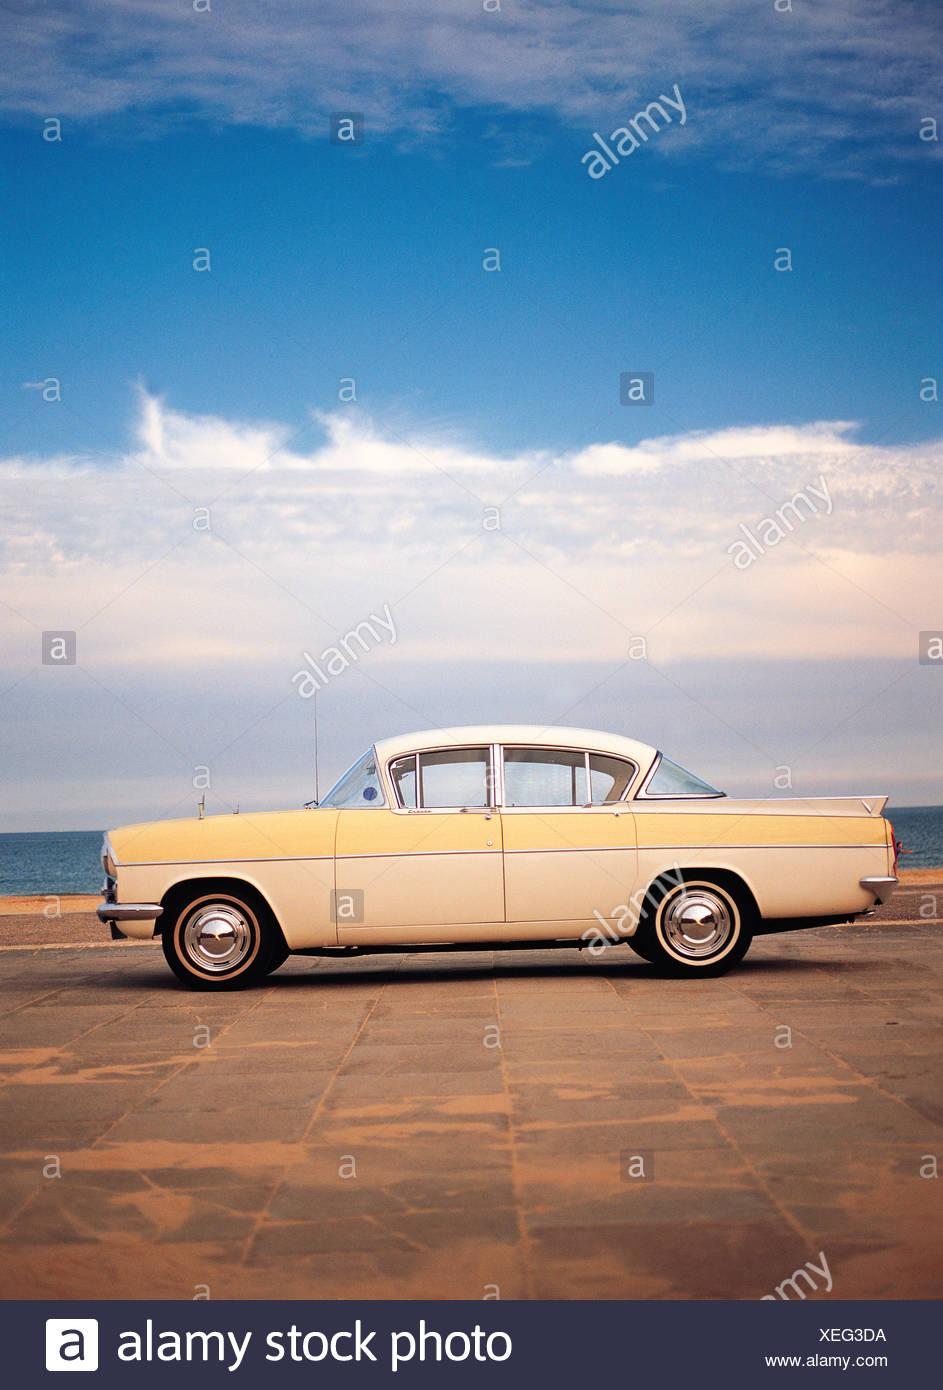 Vintage Car. Années 1950. Vauxhall Cresta. British. Photo Stock